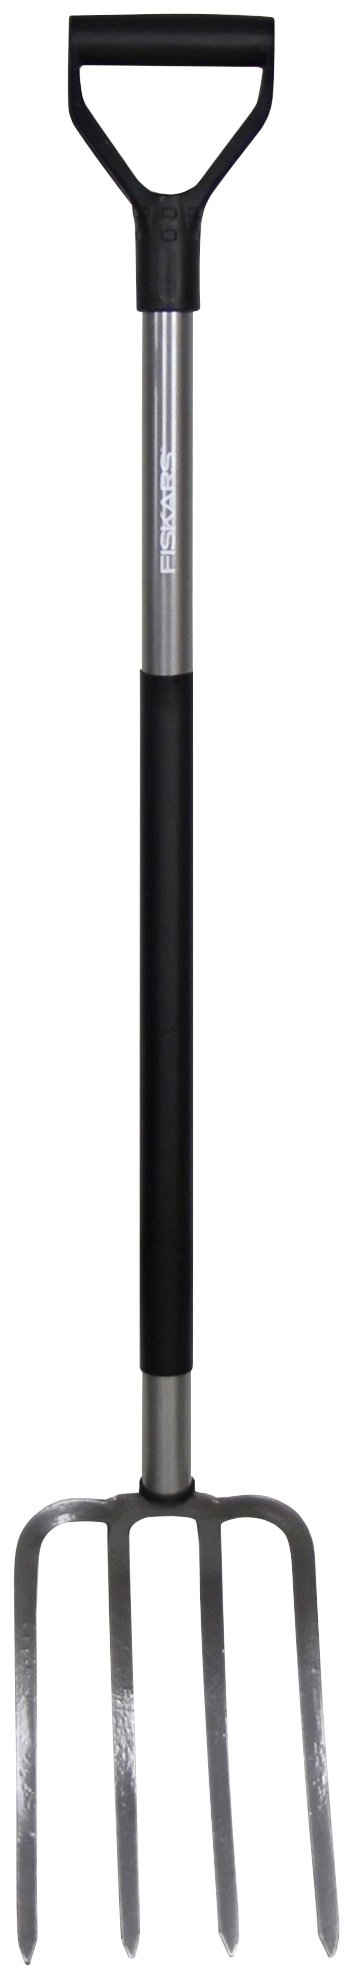 Fiskars Spatengabel »Ergonomic«, 122 cm Gesamtlänge